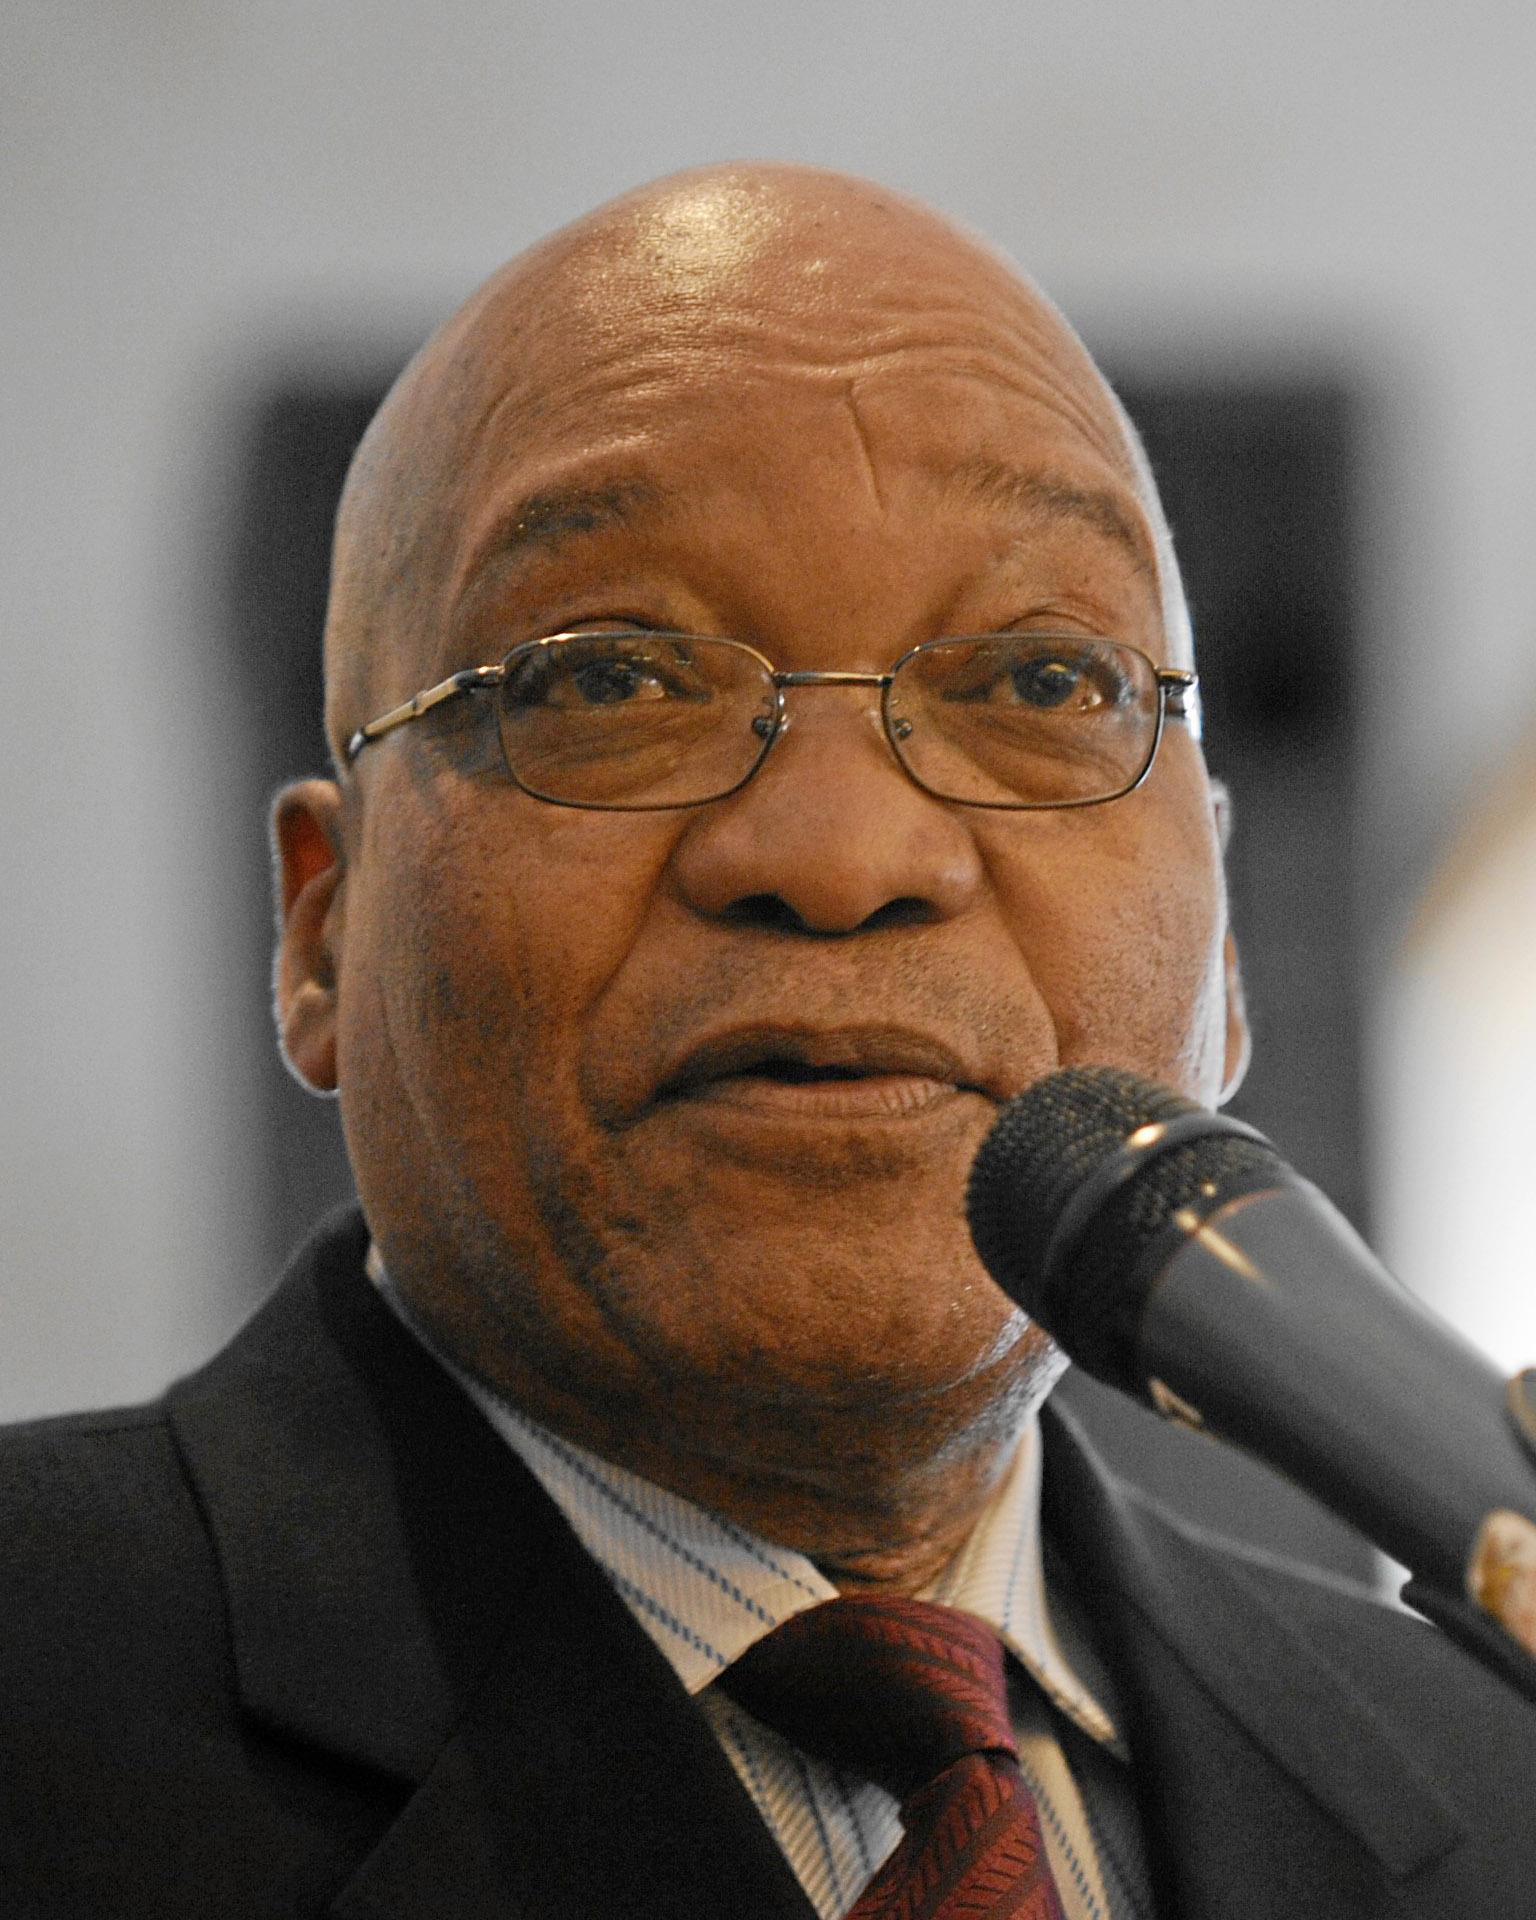 Jacob Zuma, South Africa president (Photo by Michael Wuertenberg via Wiki Commons)